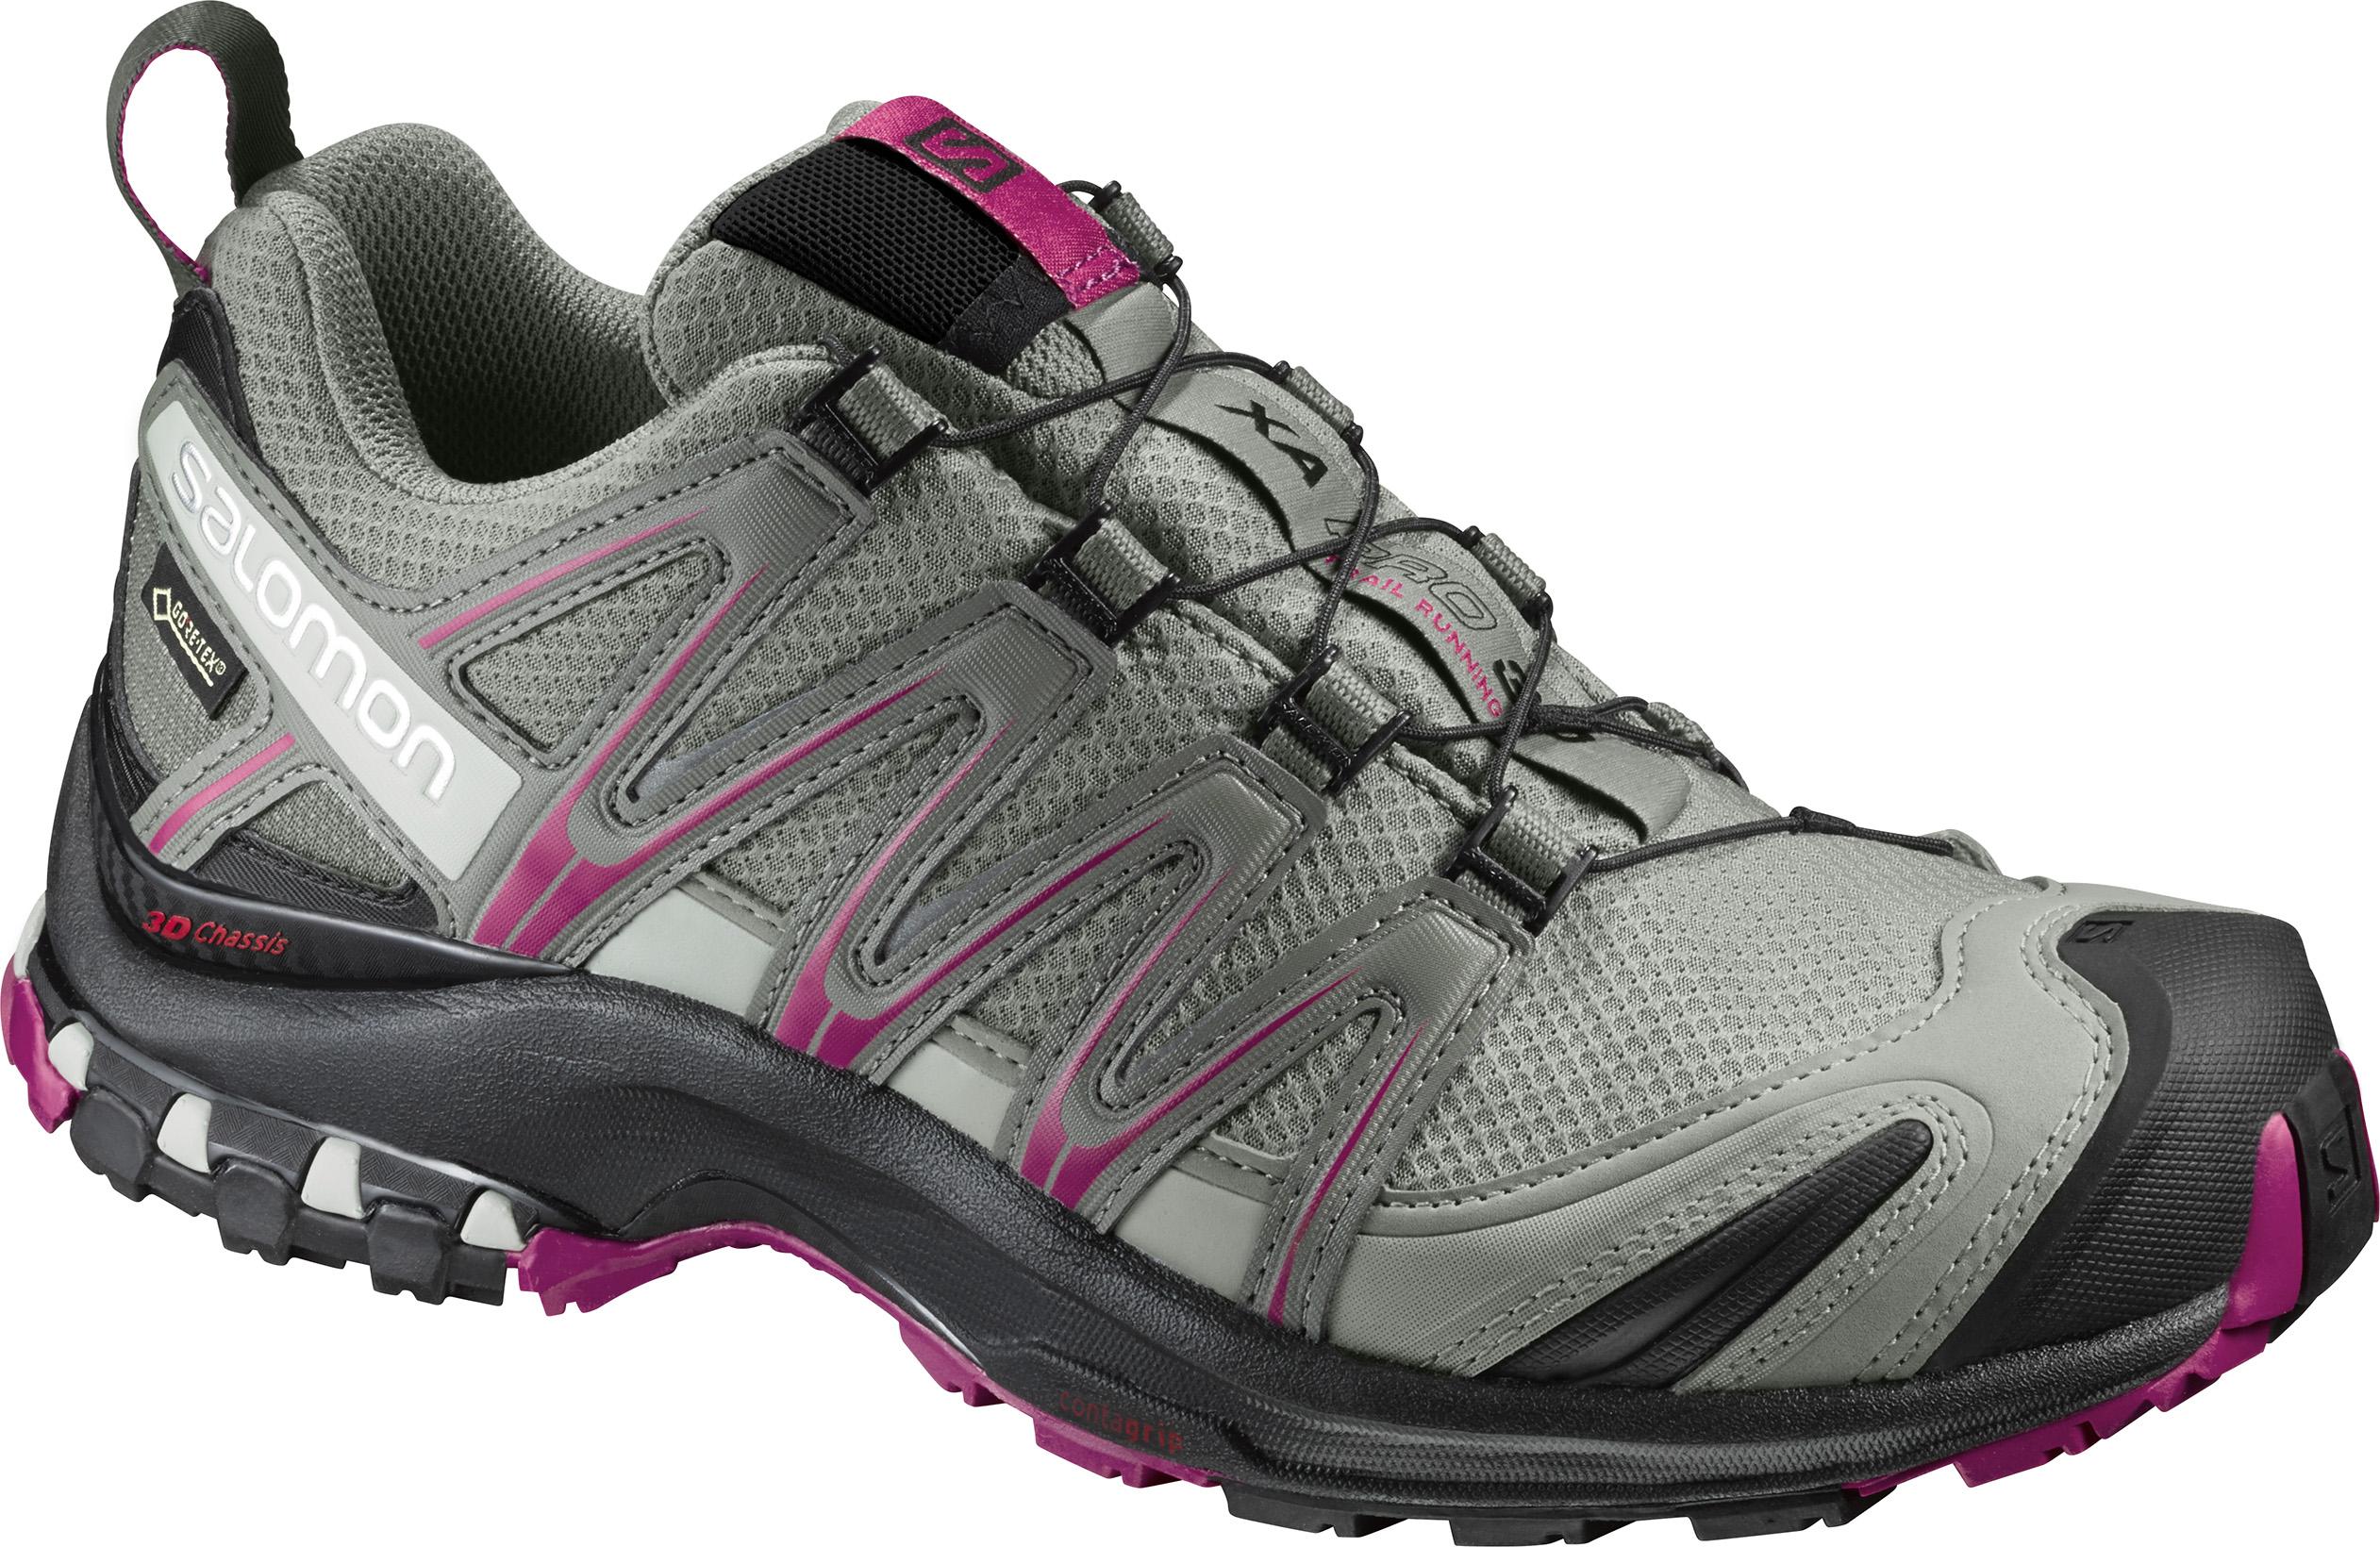 39e8c70c Salomon XA Pro 3D GTX Trail Running Shoe - Womens